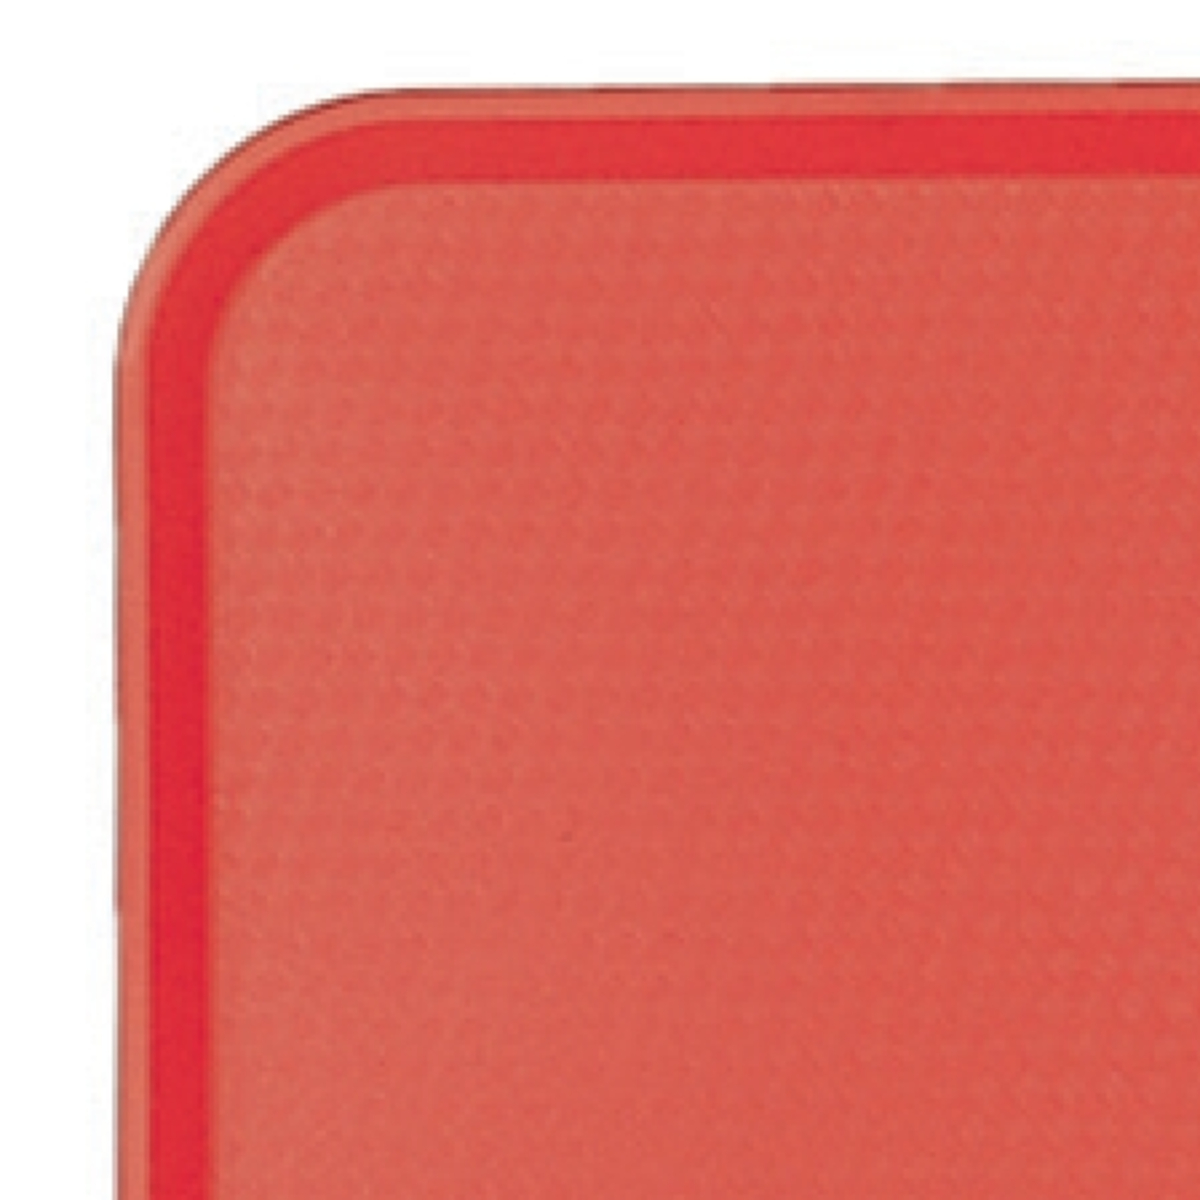 Plateau rouge plastique bord droit Fast Food Cambro